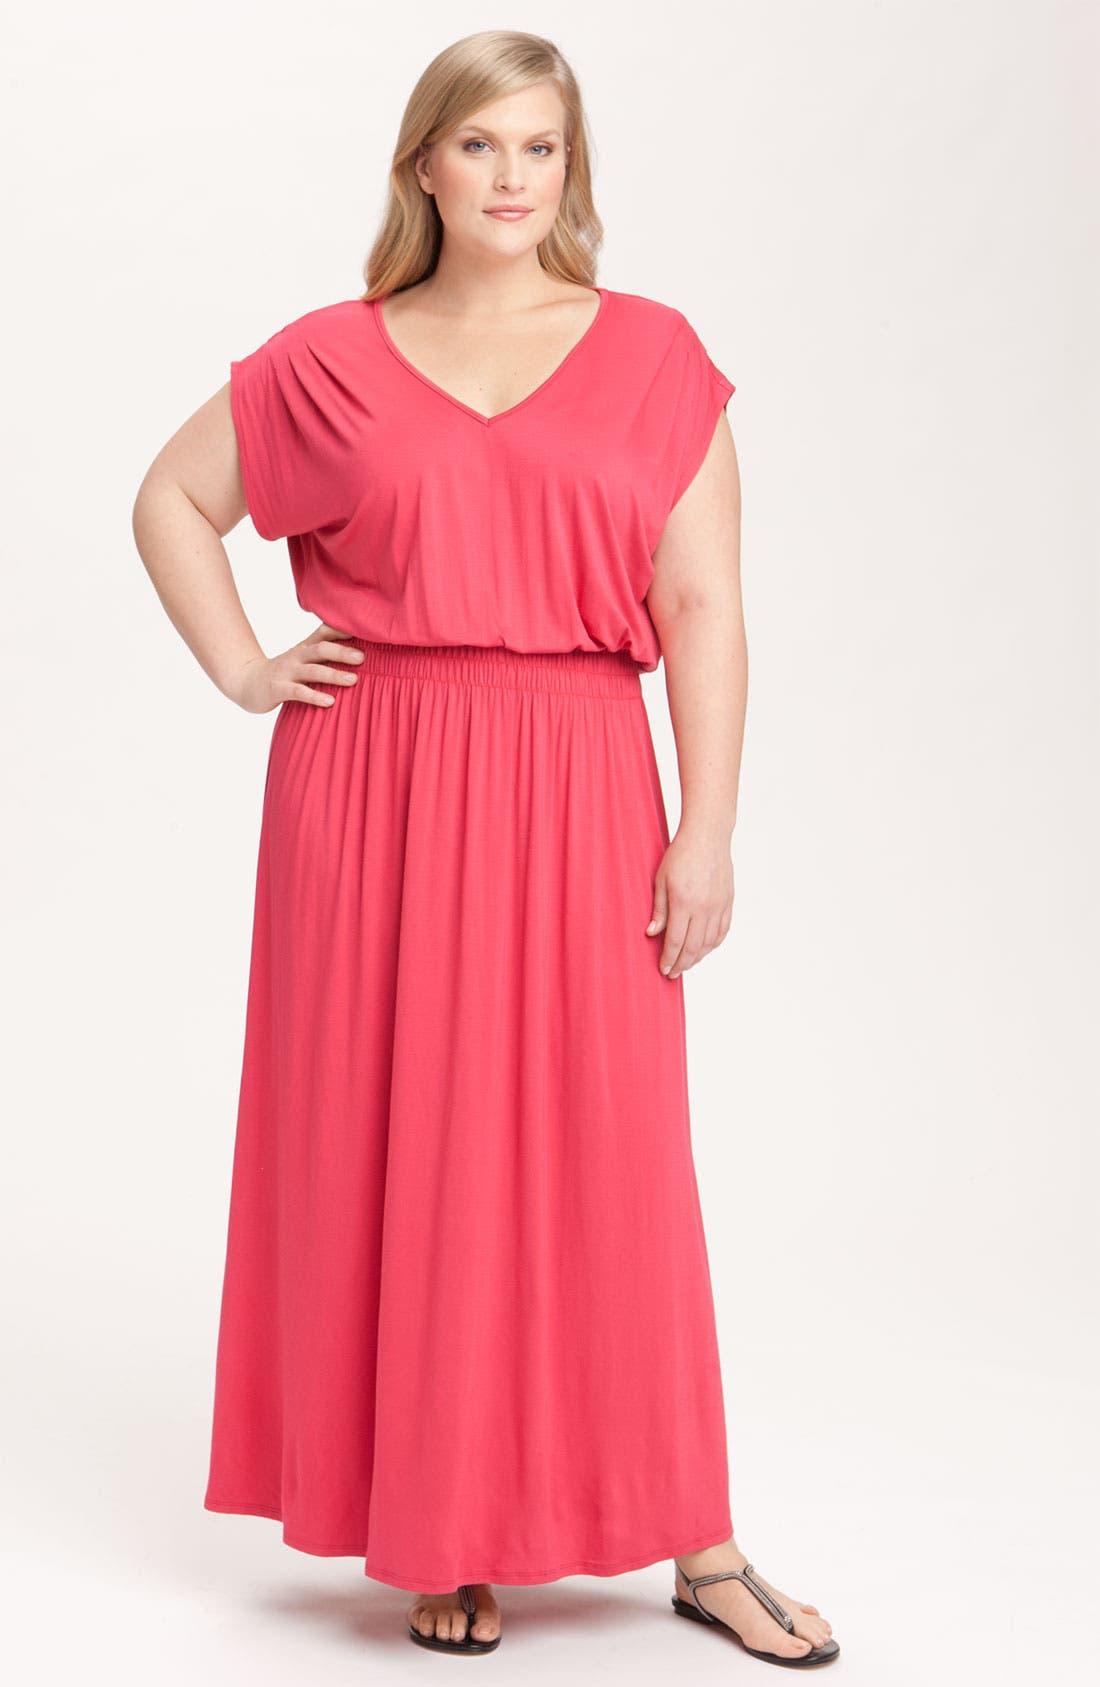 Main Image - Olivia Moon V-Neck Knit Maxi Dress (Plus)